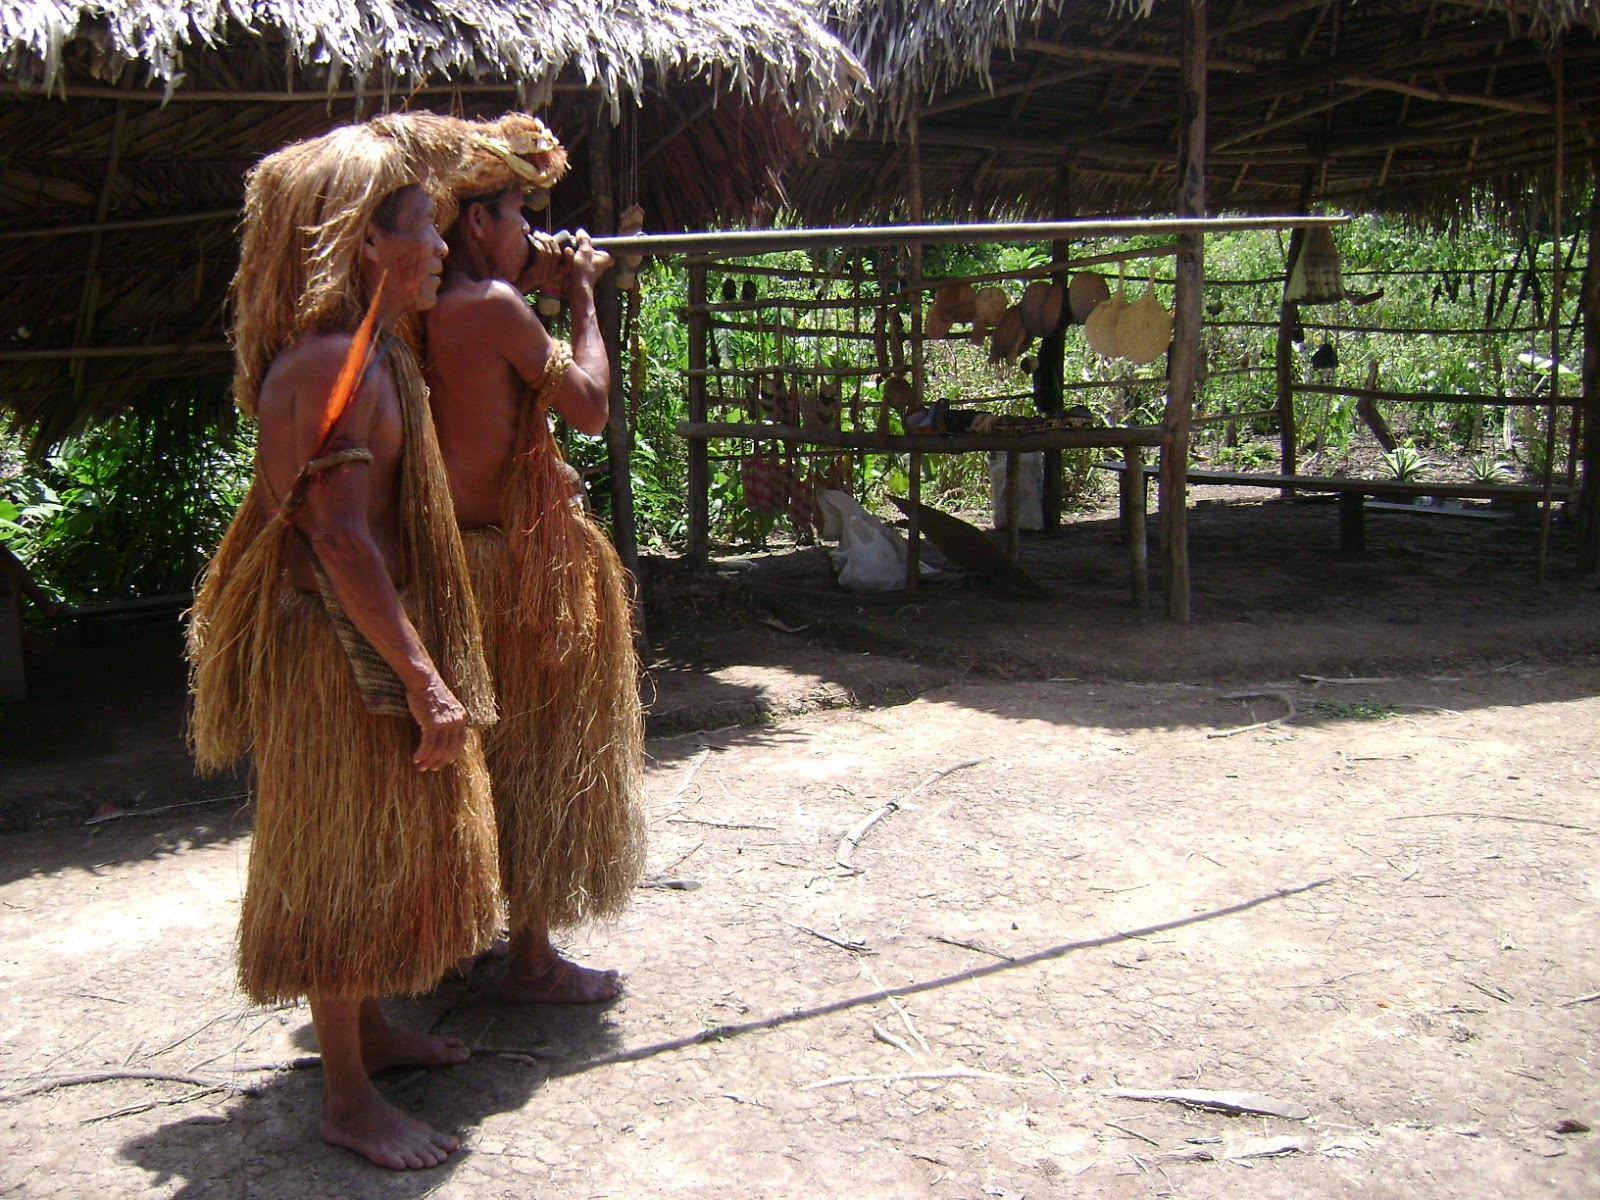 #Zarabatana, Arma Indígena